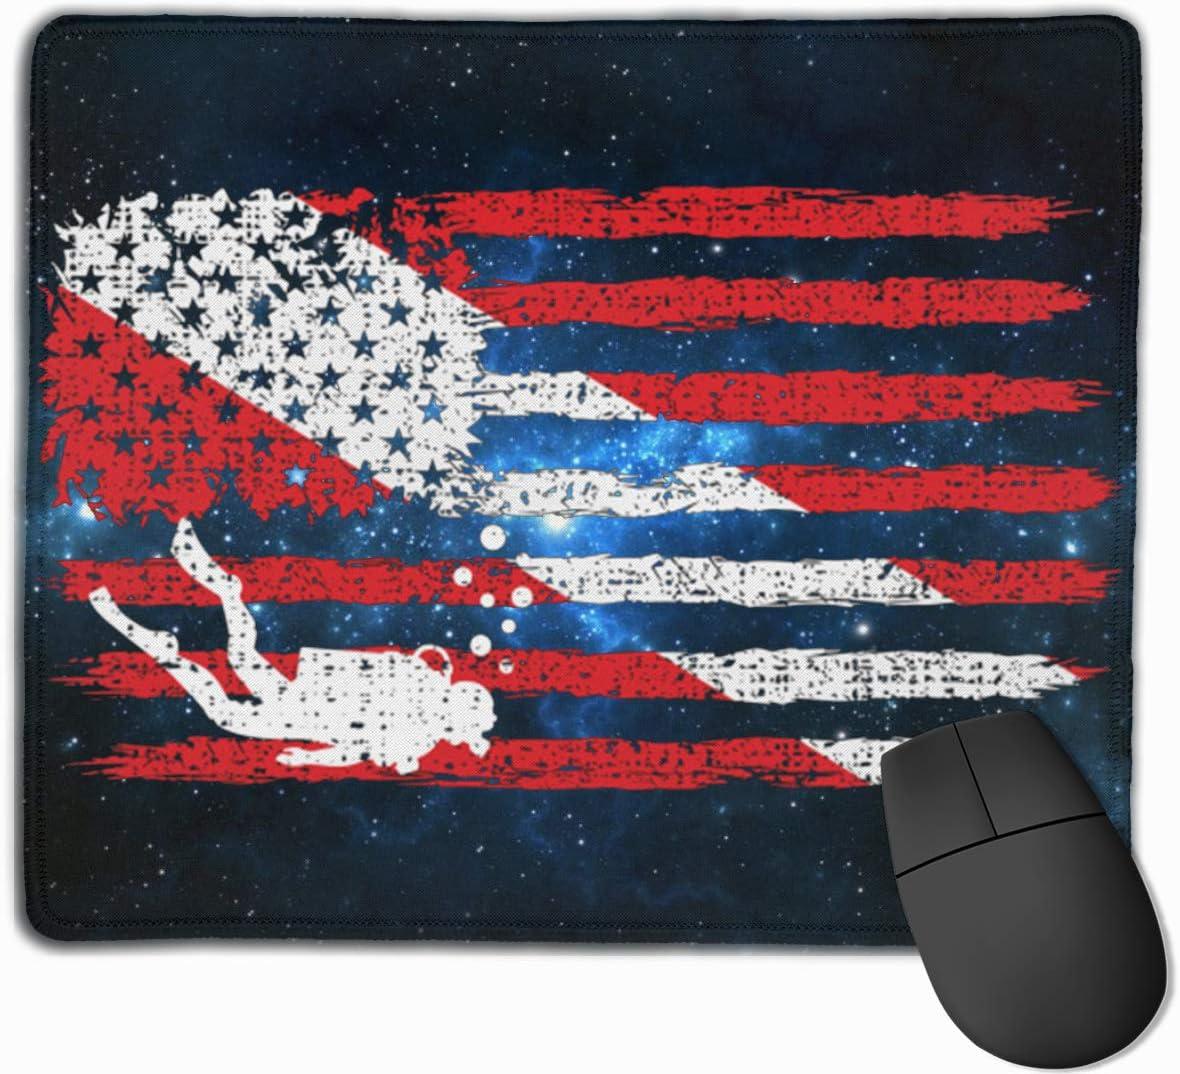 USA Scuba Diving Dive Flag Rectangle Non-Slip Rubber Mousepad Gaming Mouse Pad 25X30cm